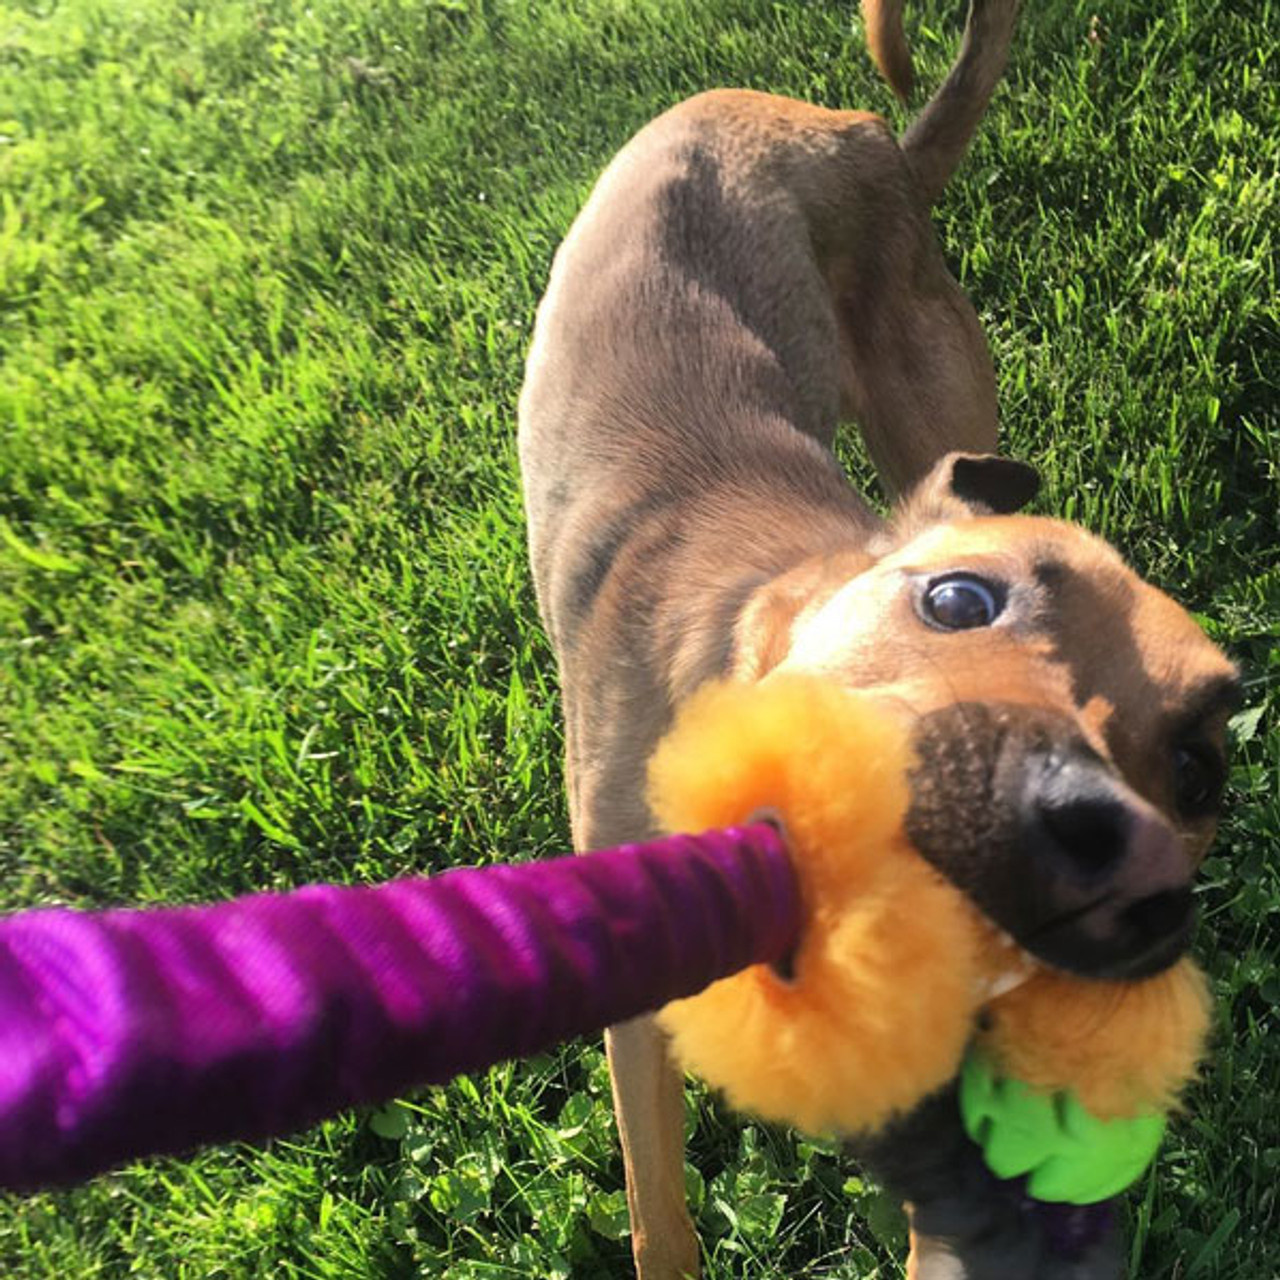 DOG TOY Breathe Right Ball MEDIUM Tug Dog Toy Microfiber with  Chuckit Dog toy chenille Dog tug toy Durable dog toy